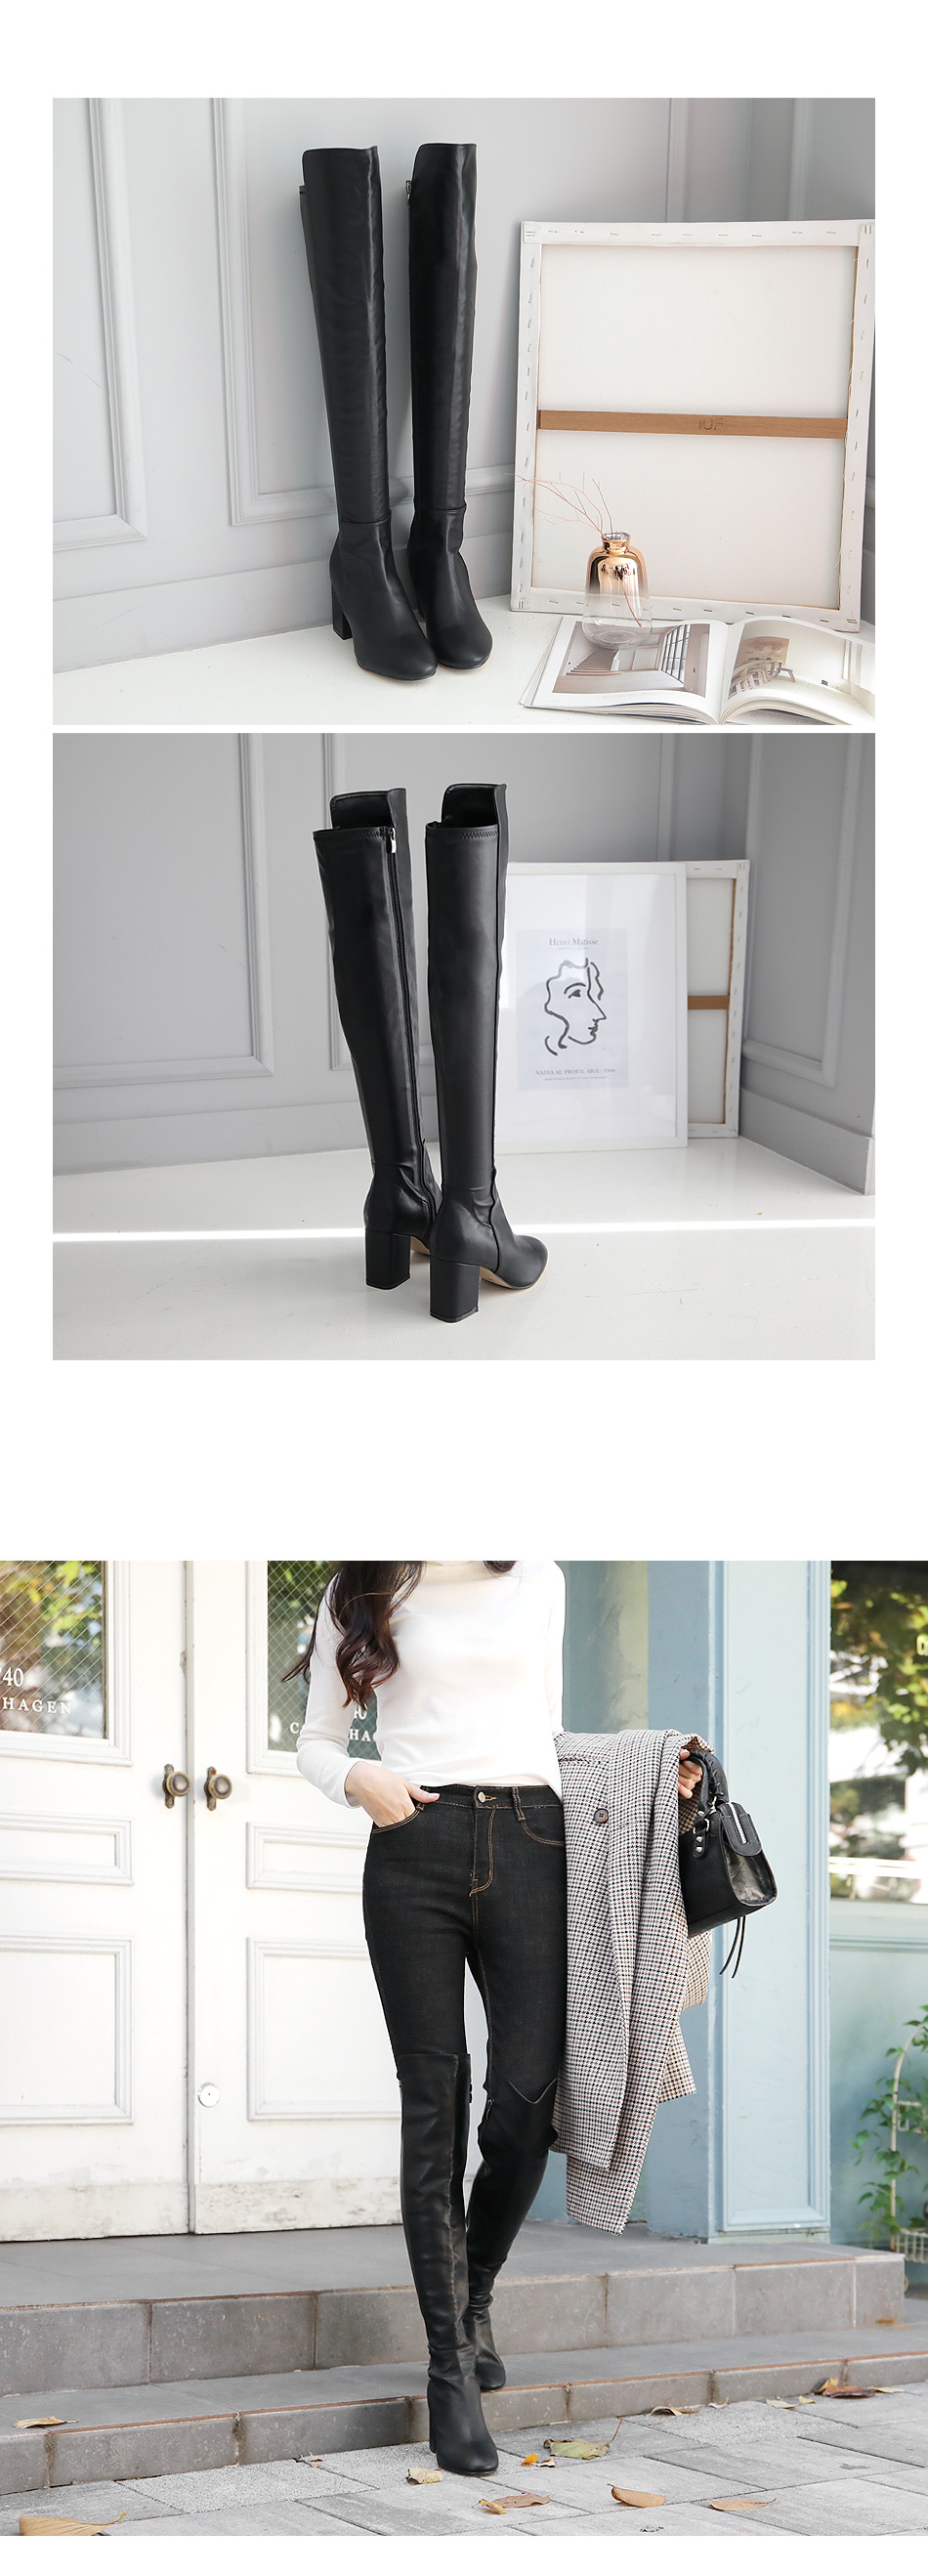 Ferrens Nie High Boots 8cm